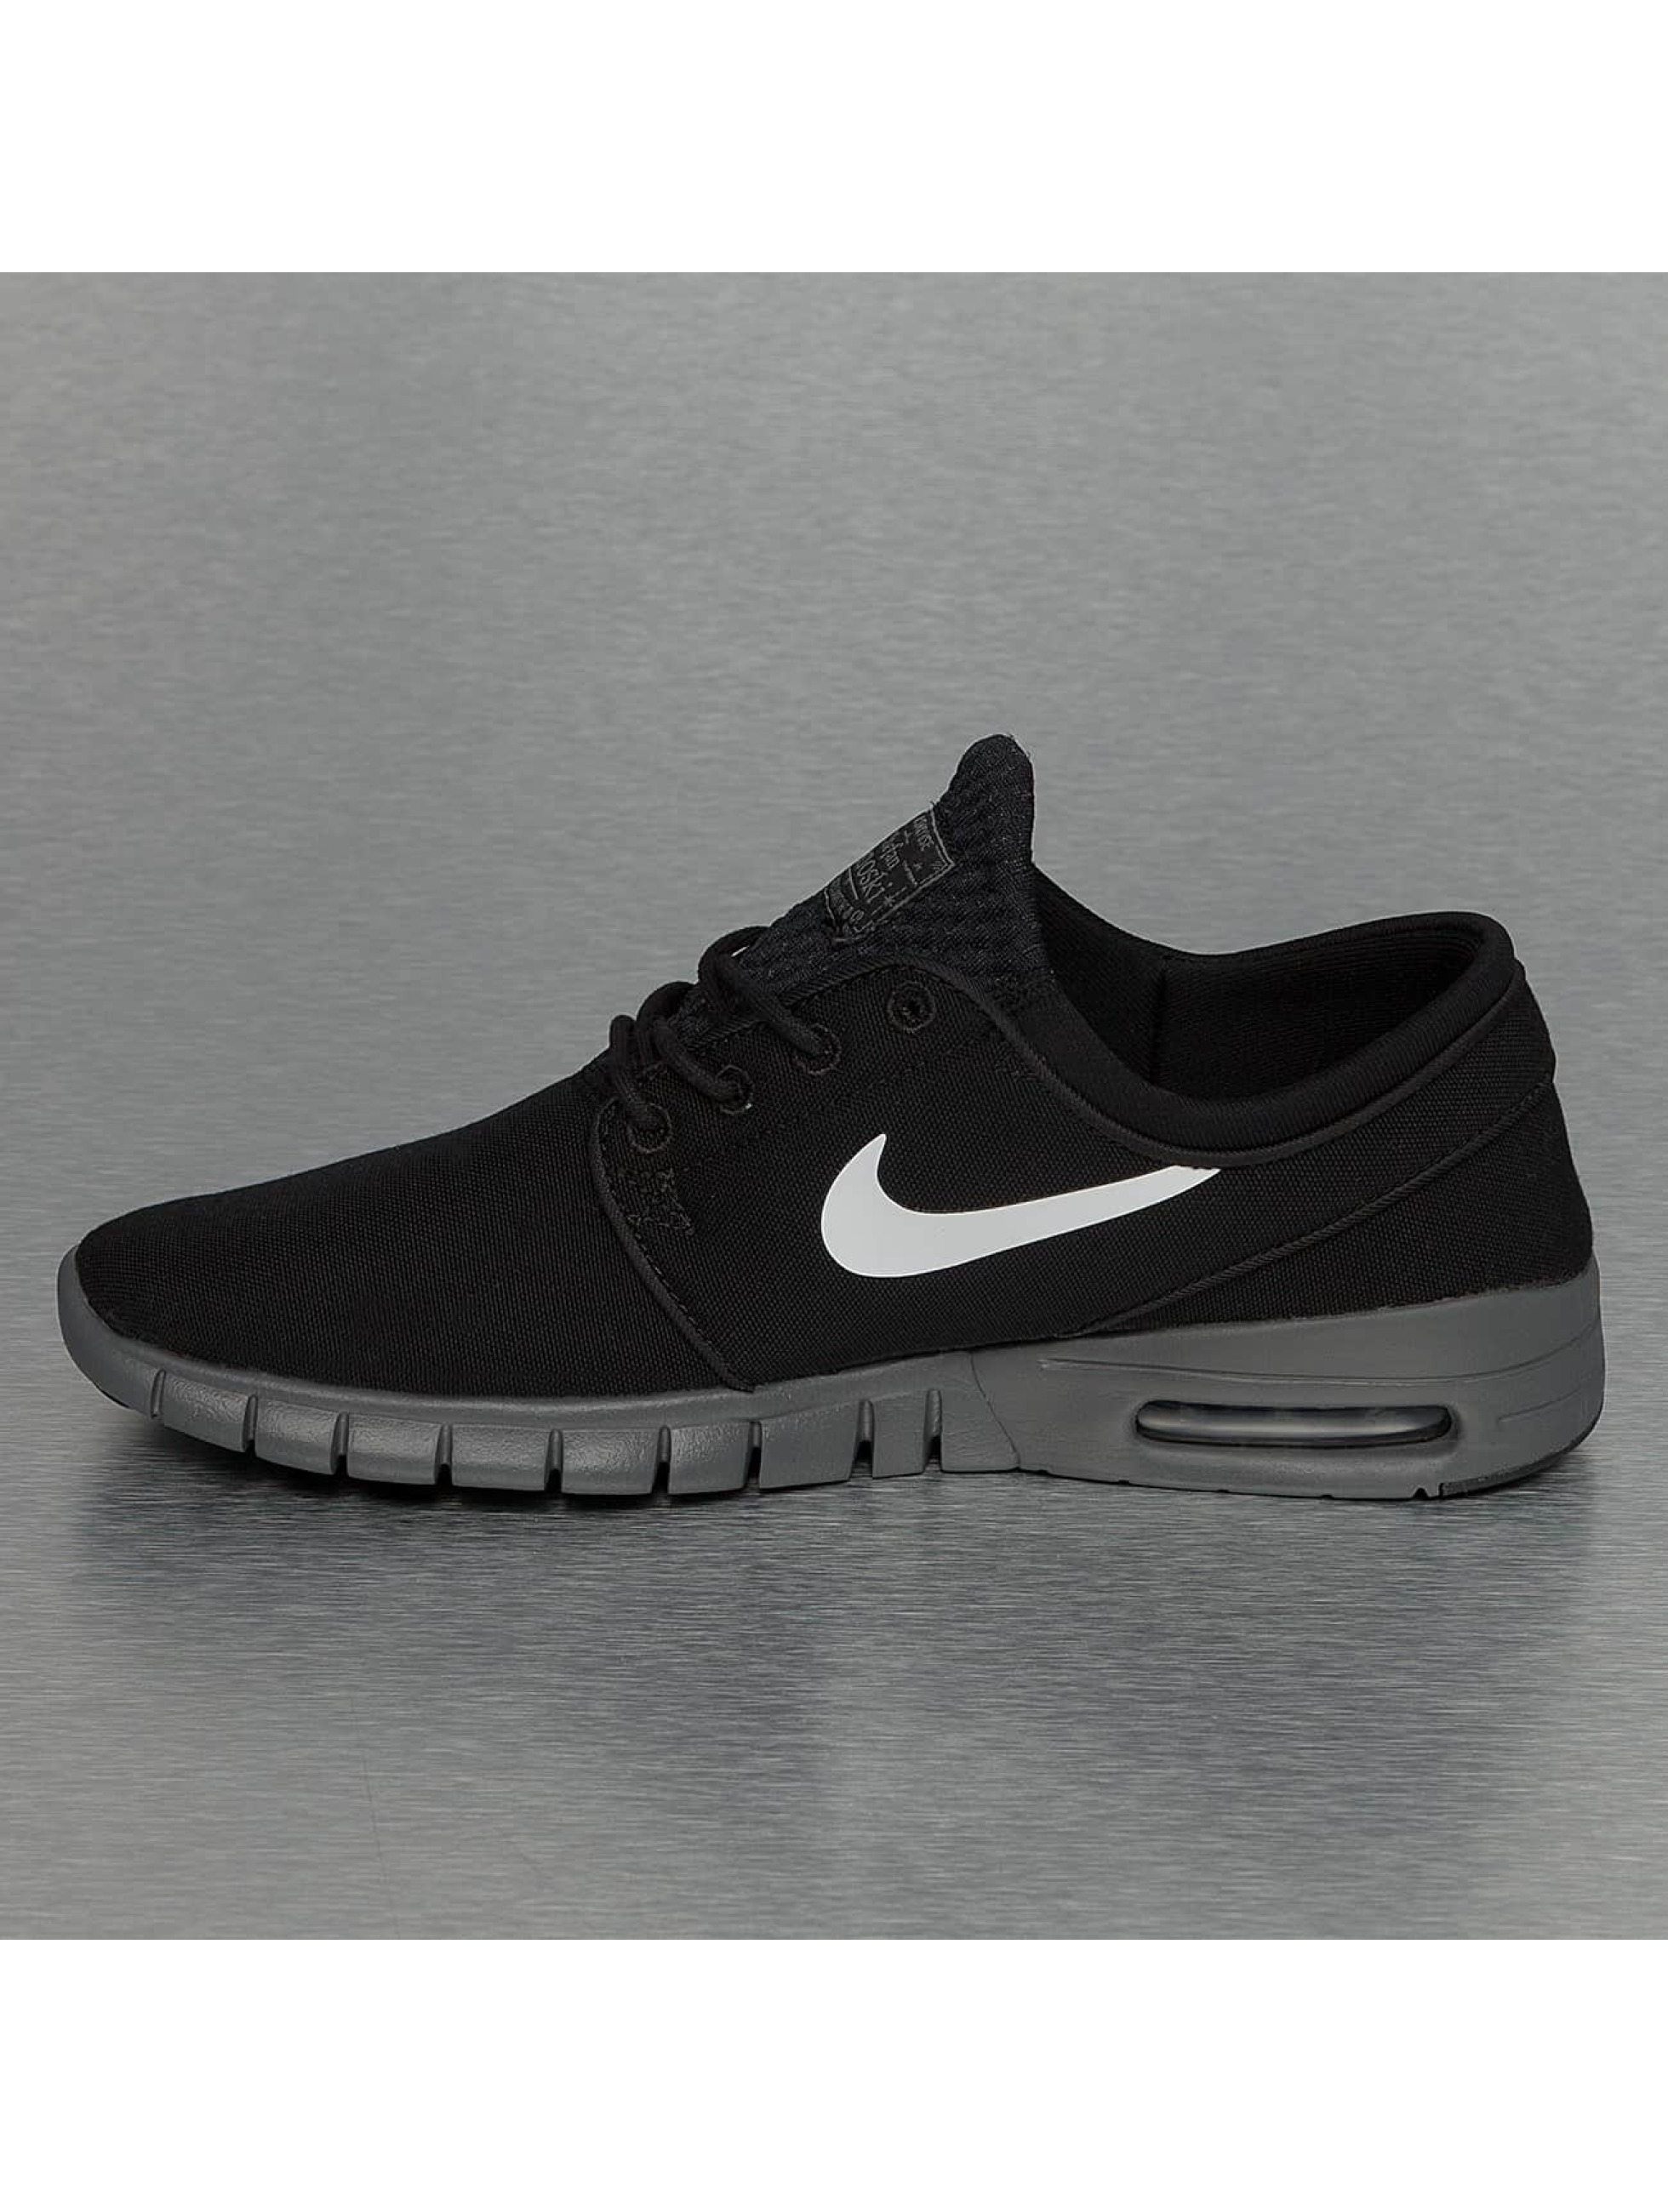 Nike Sb Stefan Janoski Schuhe Schwarz Grau